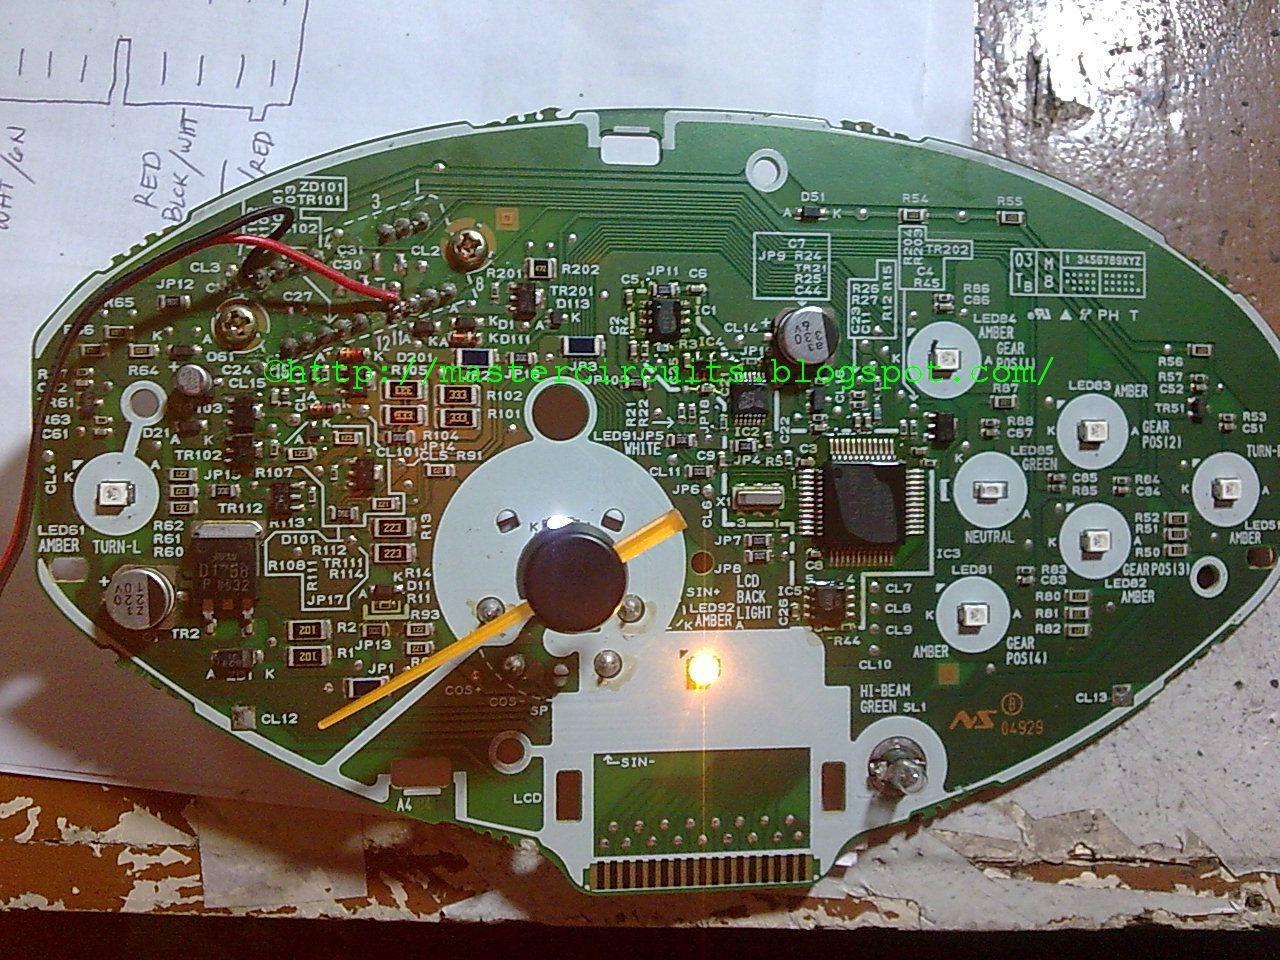 Wave 125 S Panel Repair Techy At Day Blogger Noon And A Wiring Diagram Honda Hobbyist Night